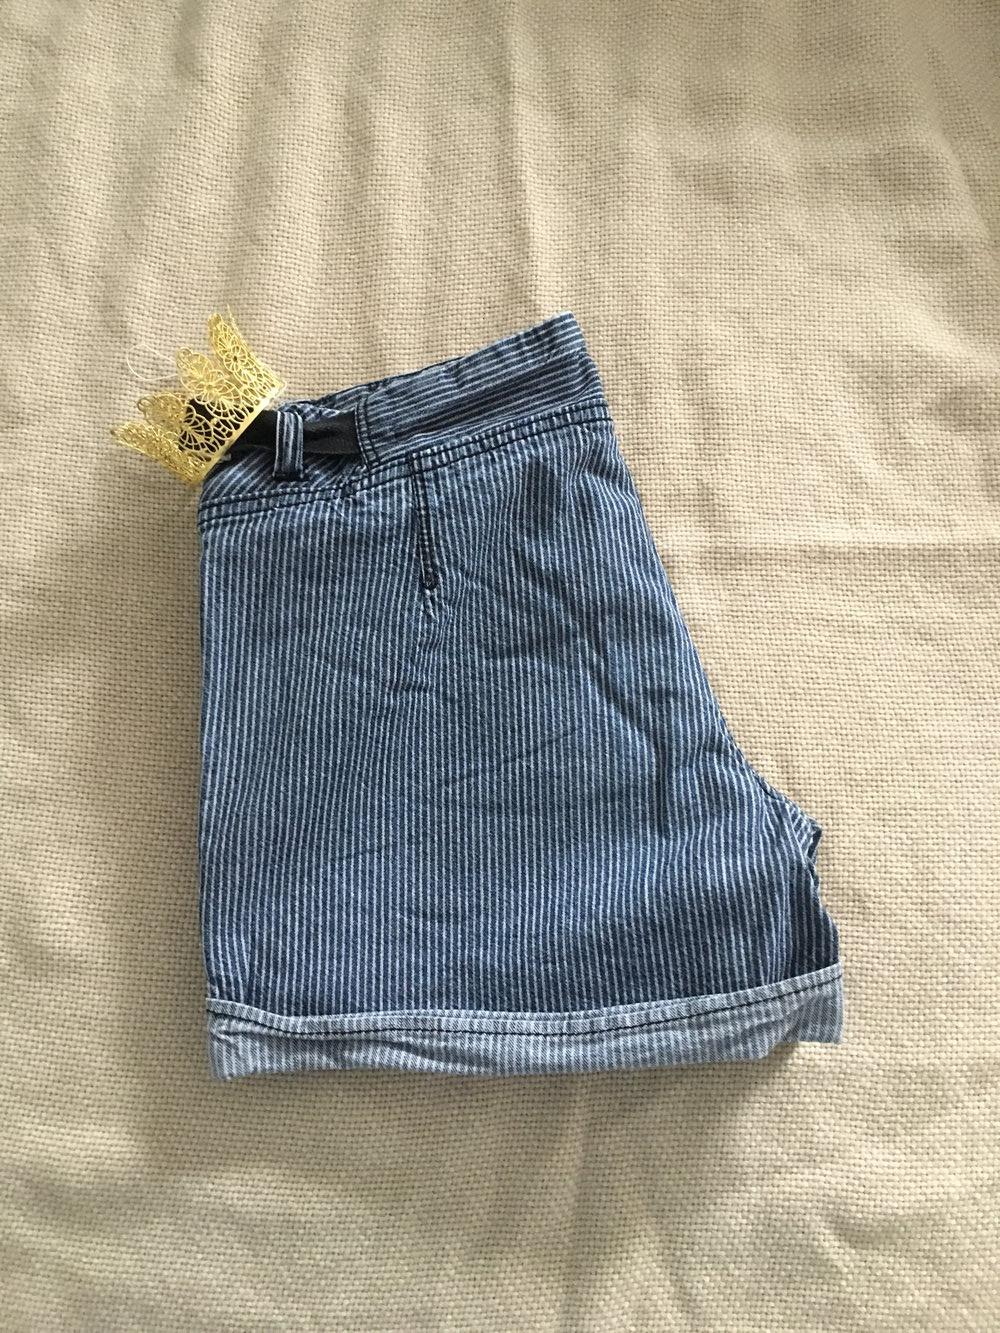 ... Schicke blau grau gestreifte Shorts, Hotpants, Streifen, kurze Hose ... 9cff4ede54